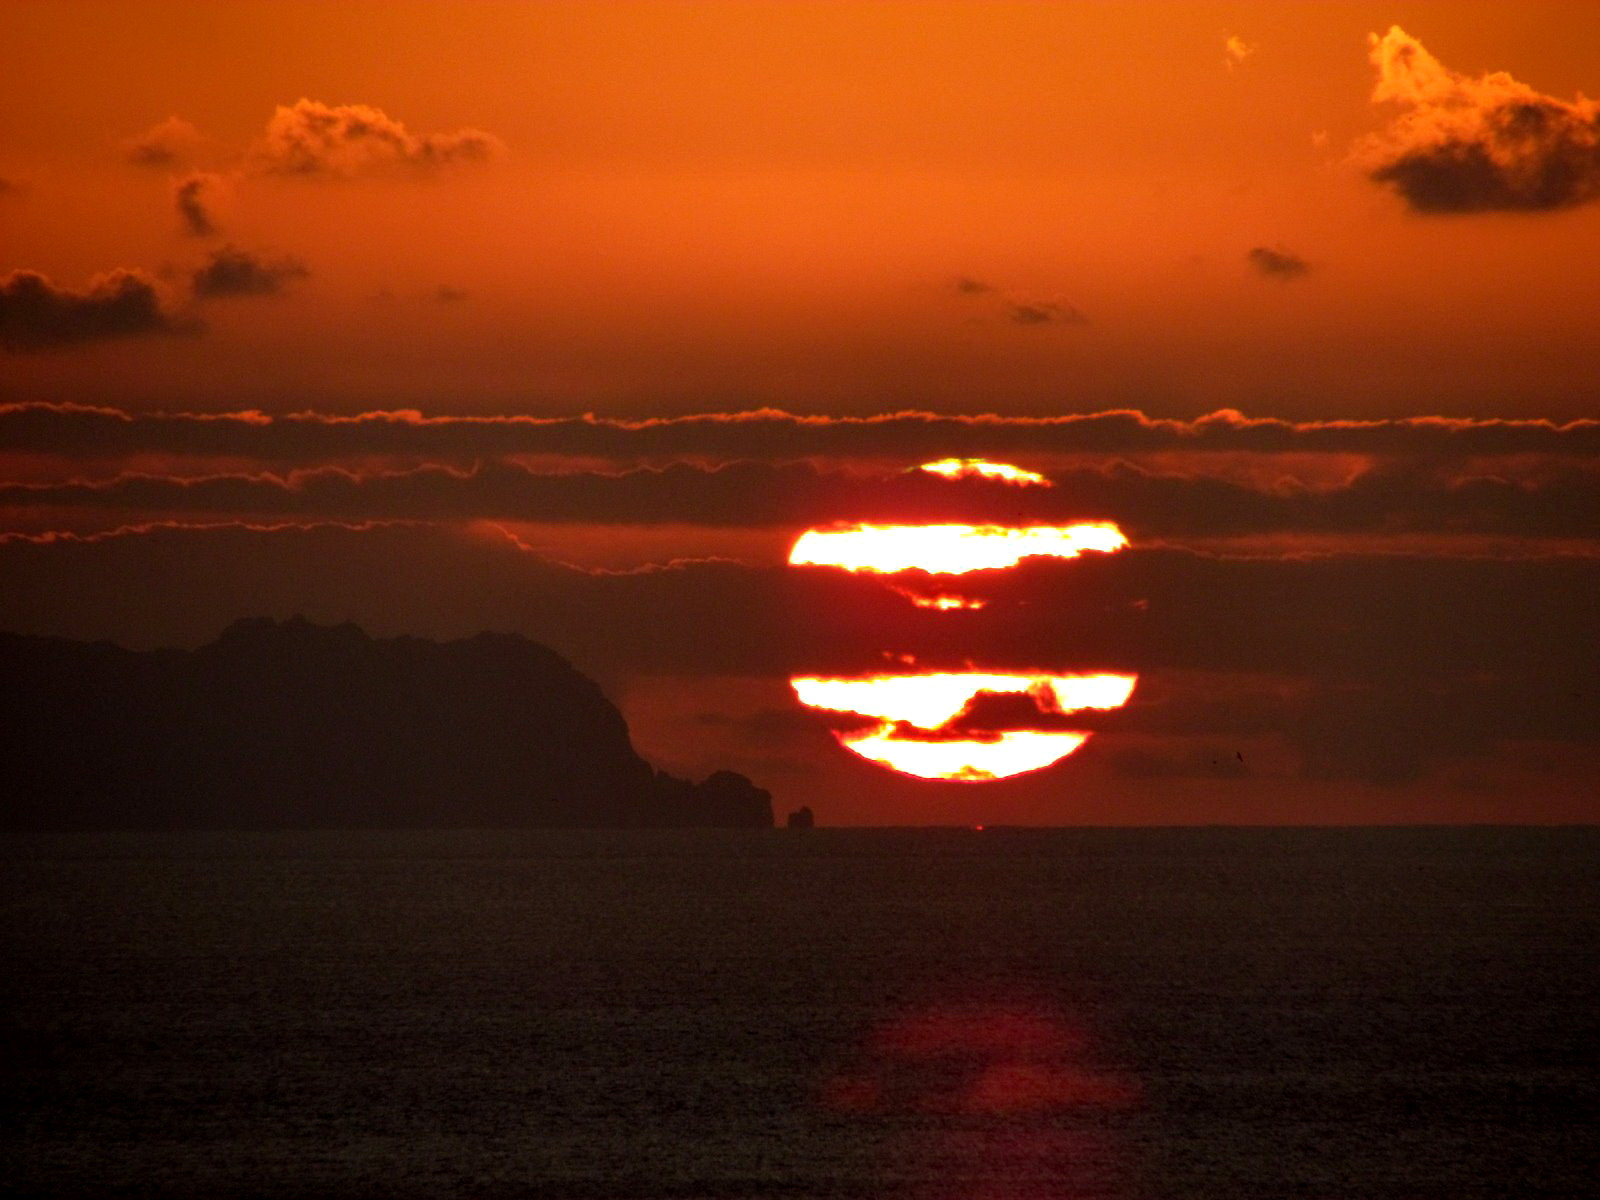 sunrise on the Desertas islands